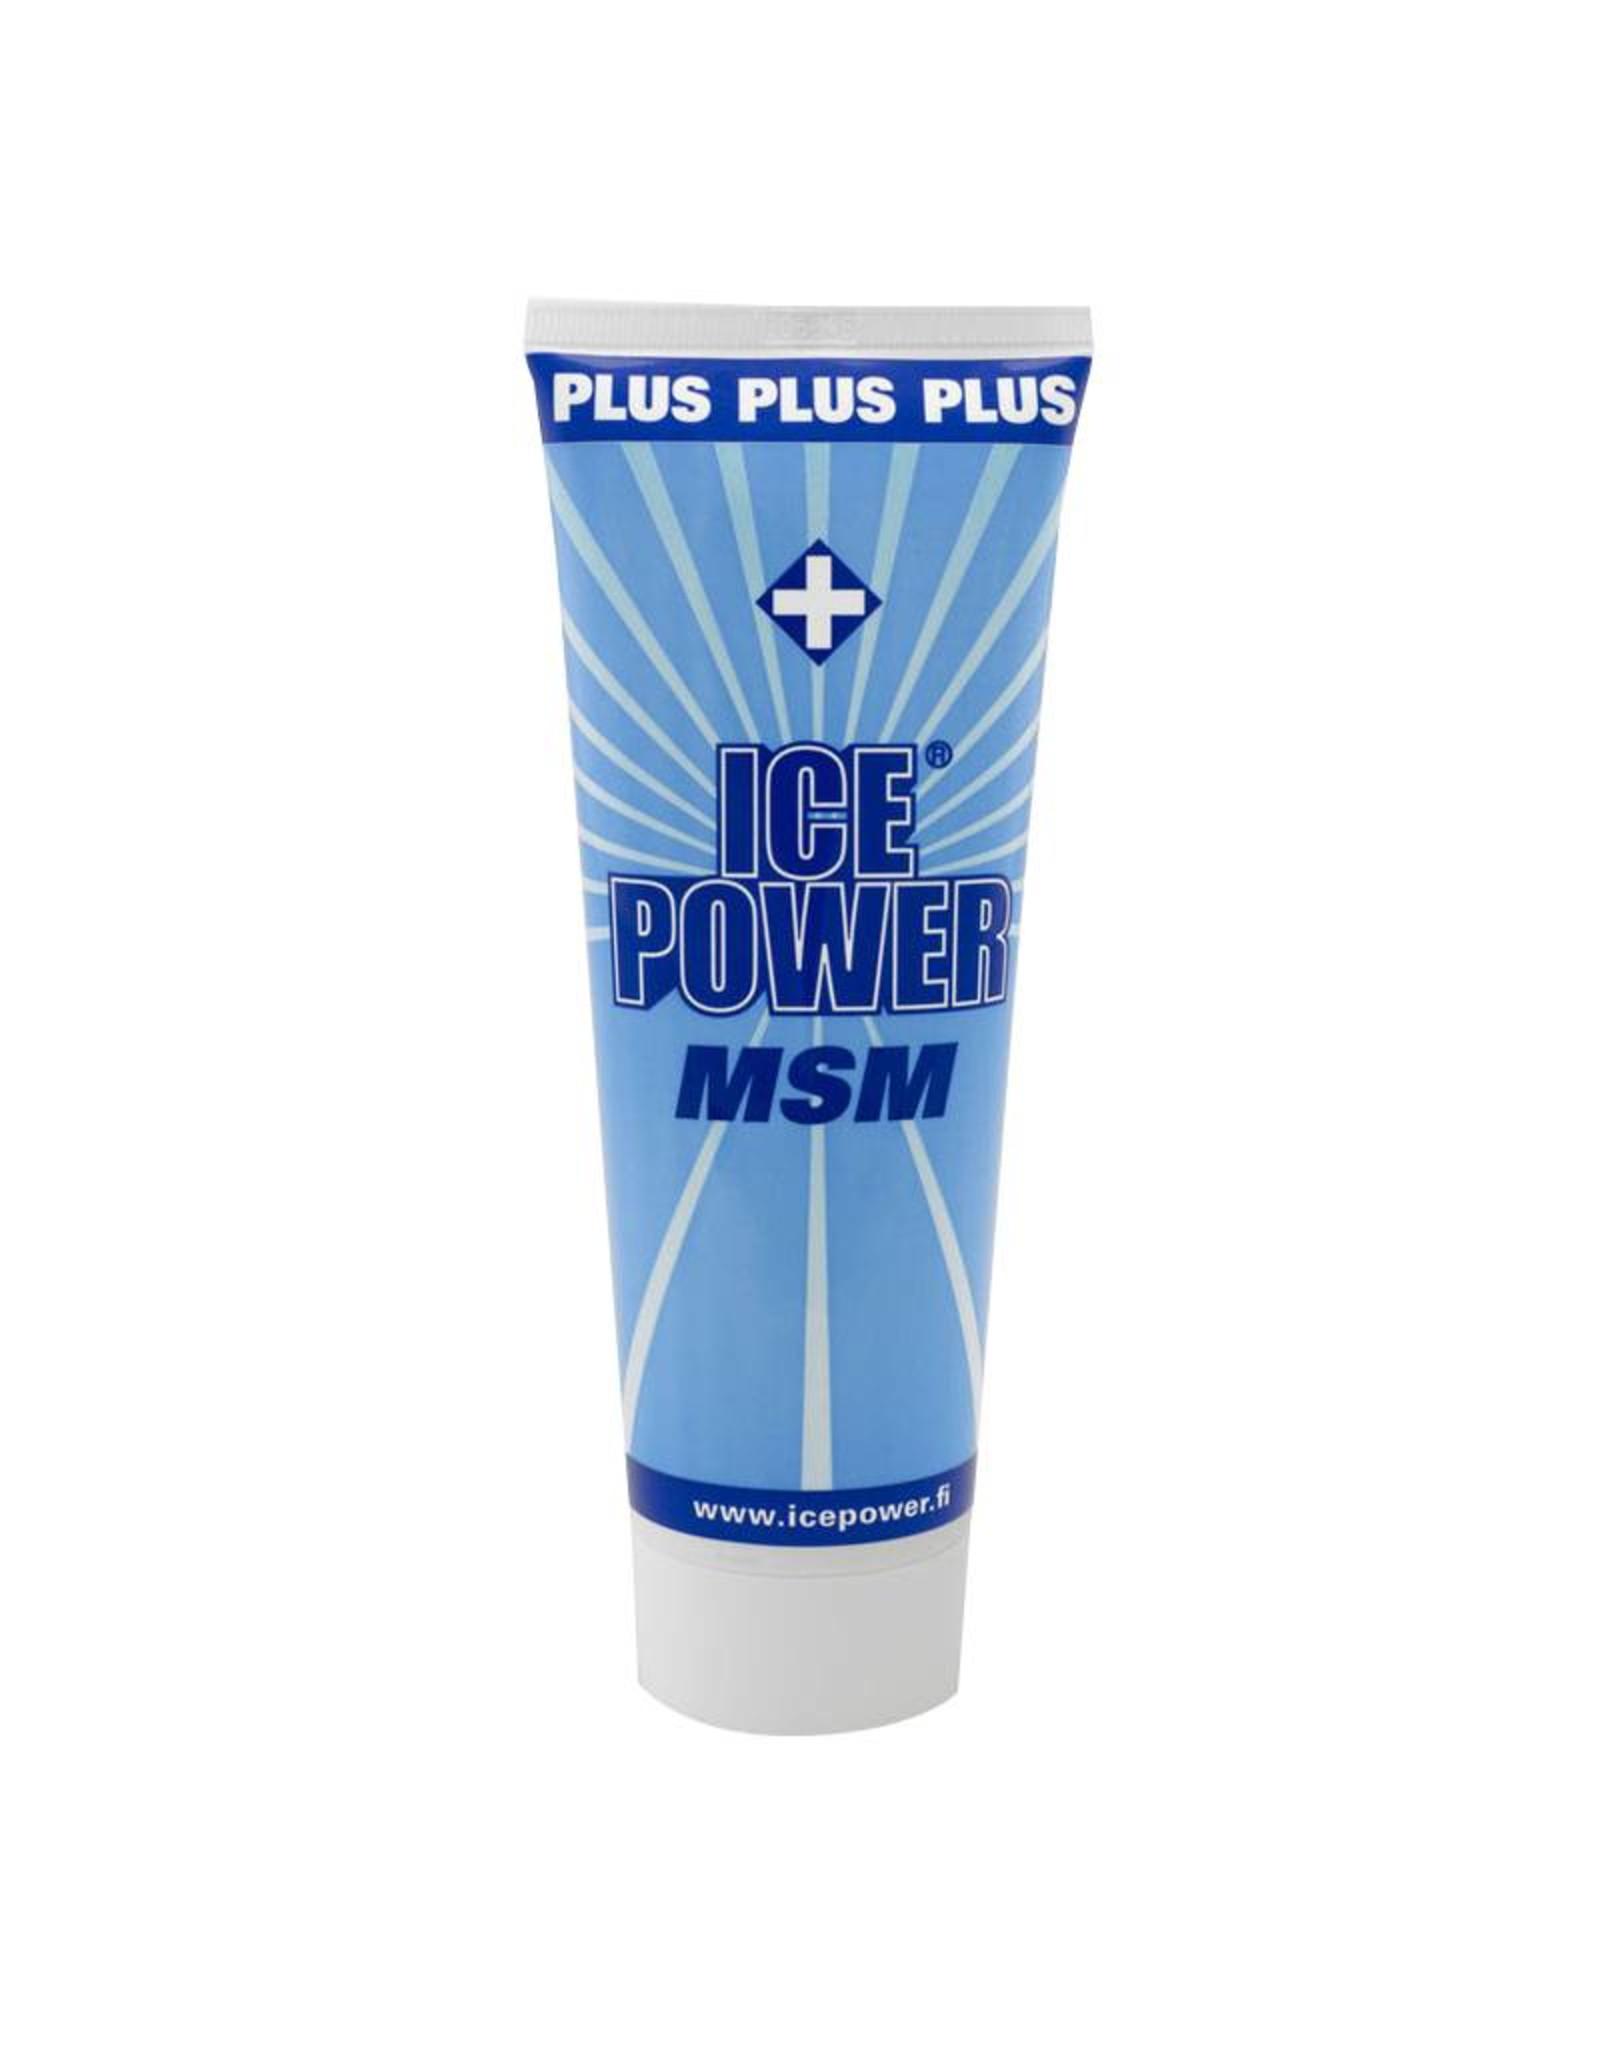 Ice Power + MSM Gel 100ml